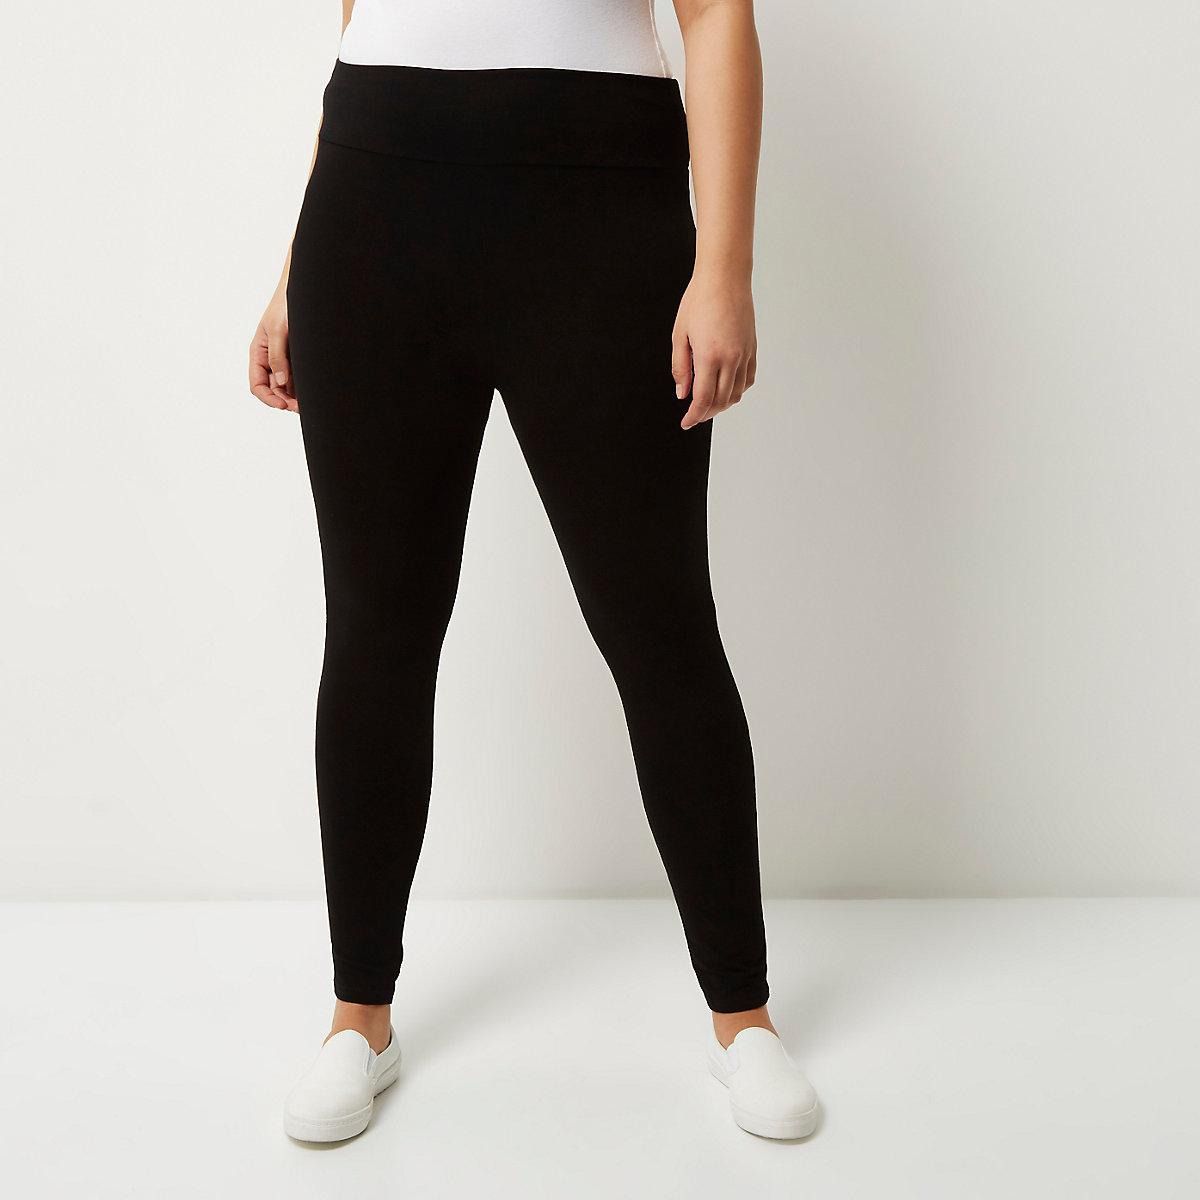 Plus black high rise leggings